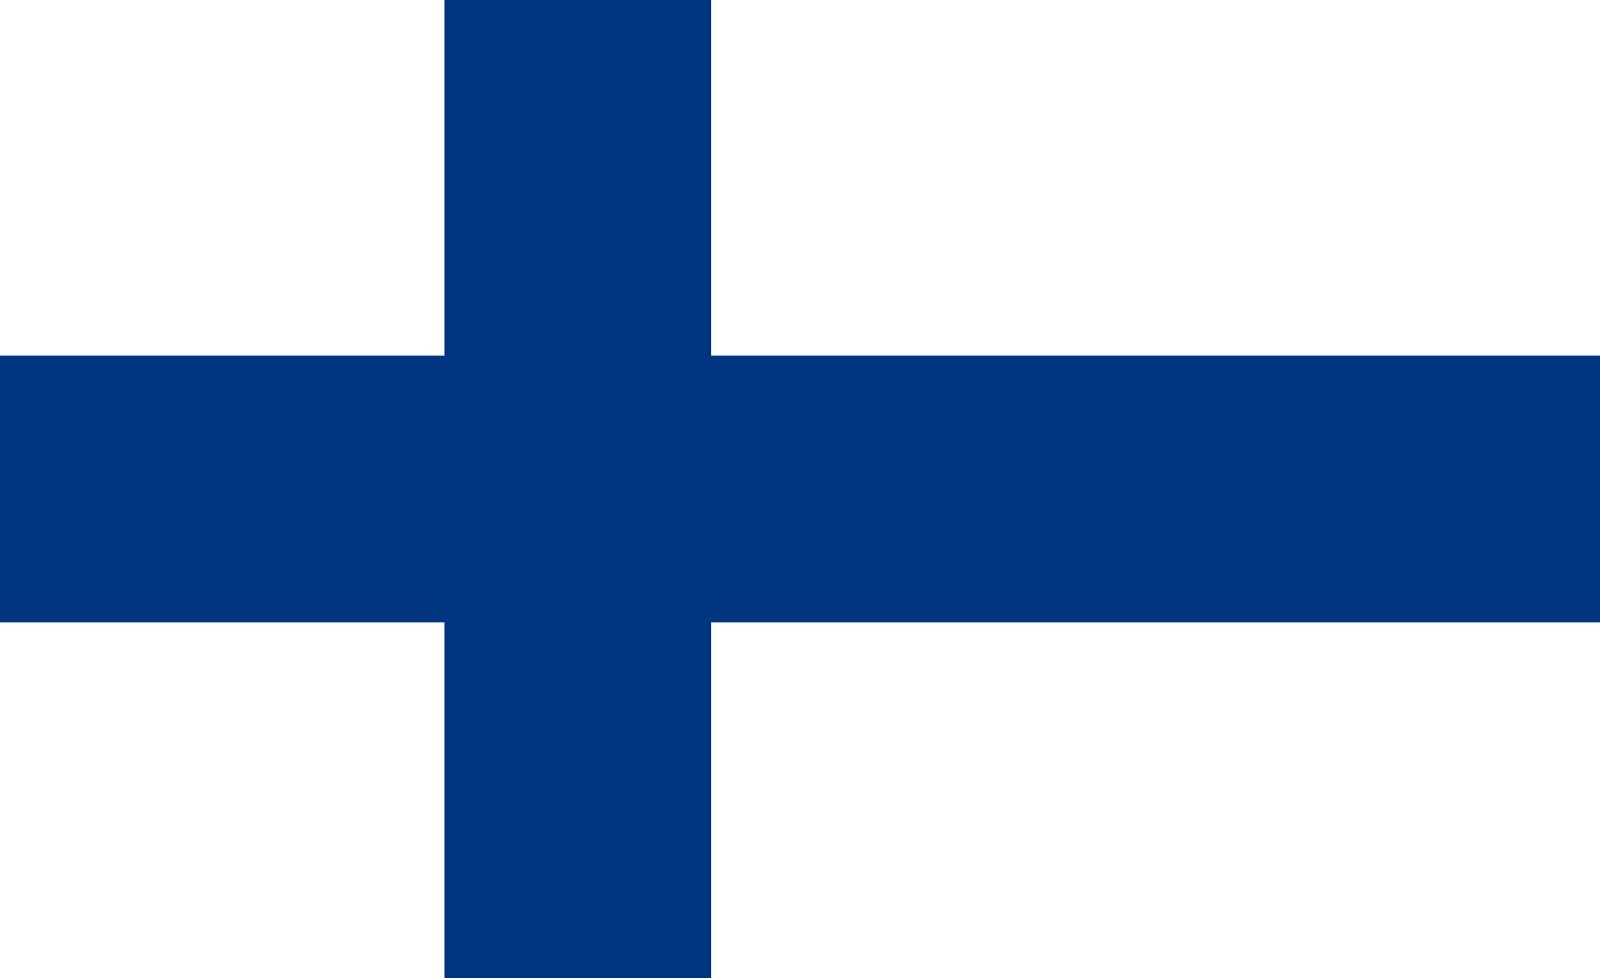 http://carbrandsincurrentproduction.blogspot.com.es/search/label/Finland